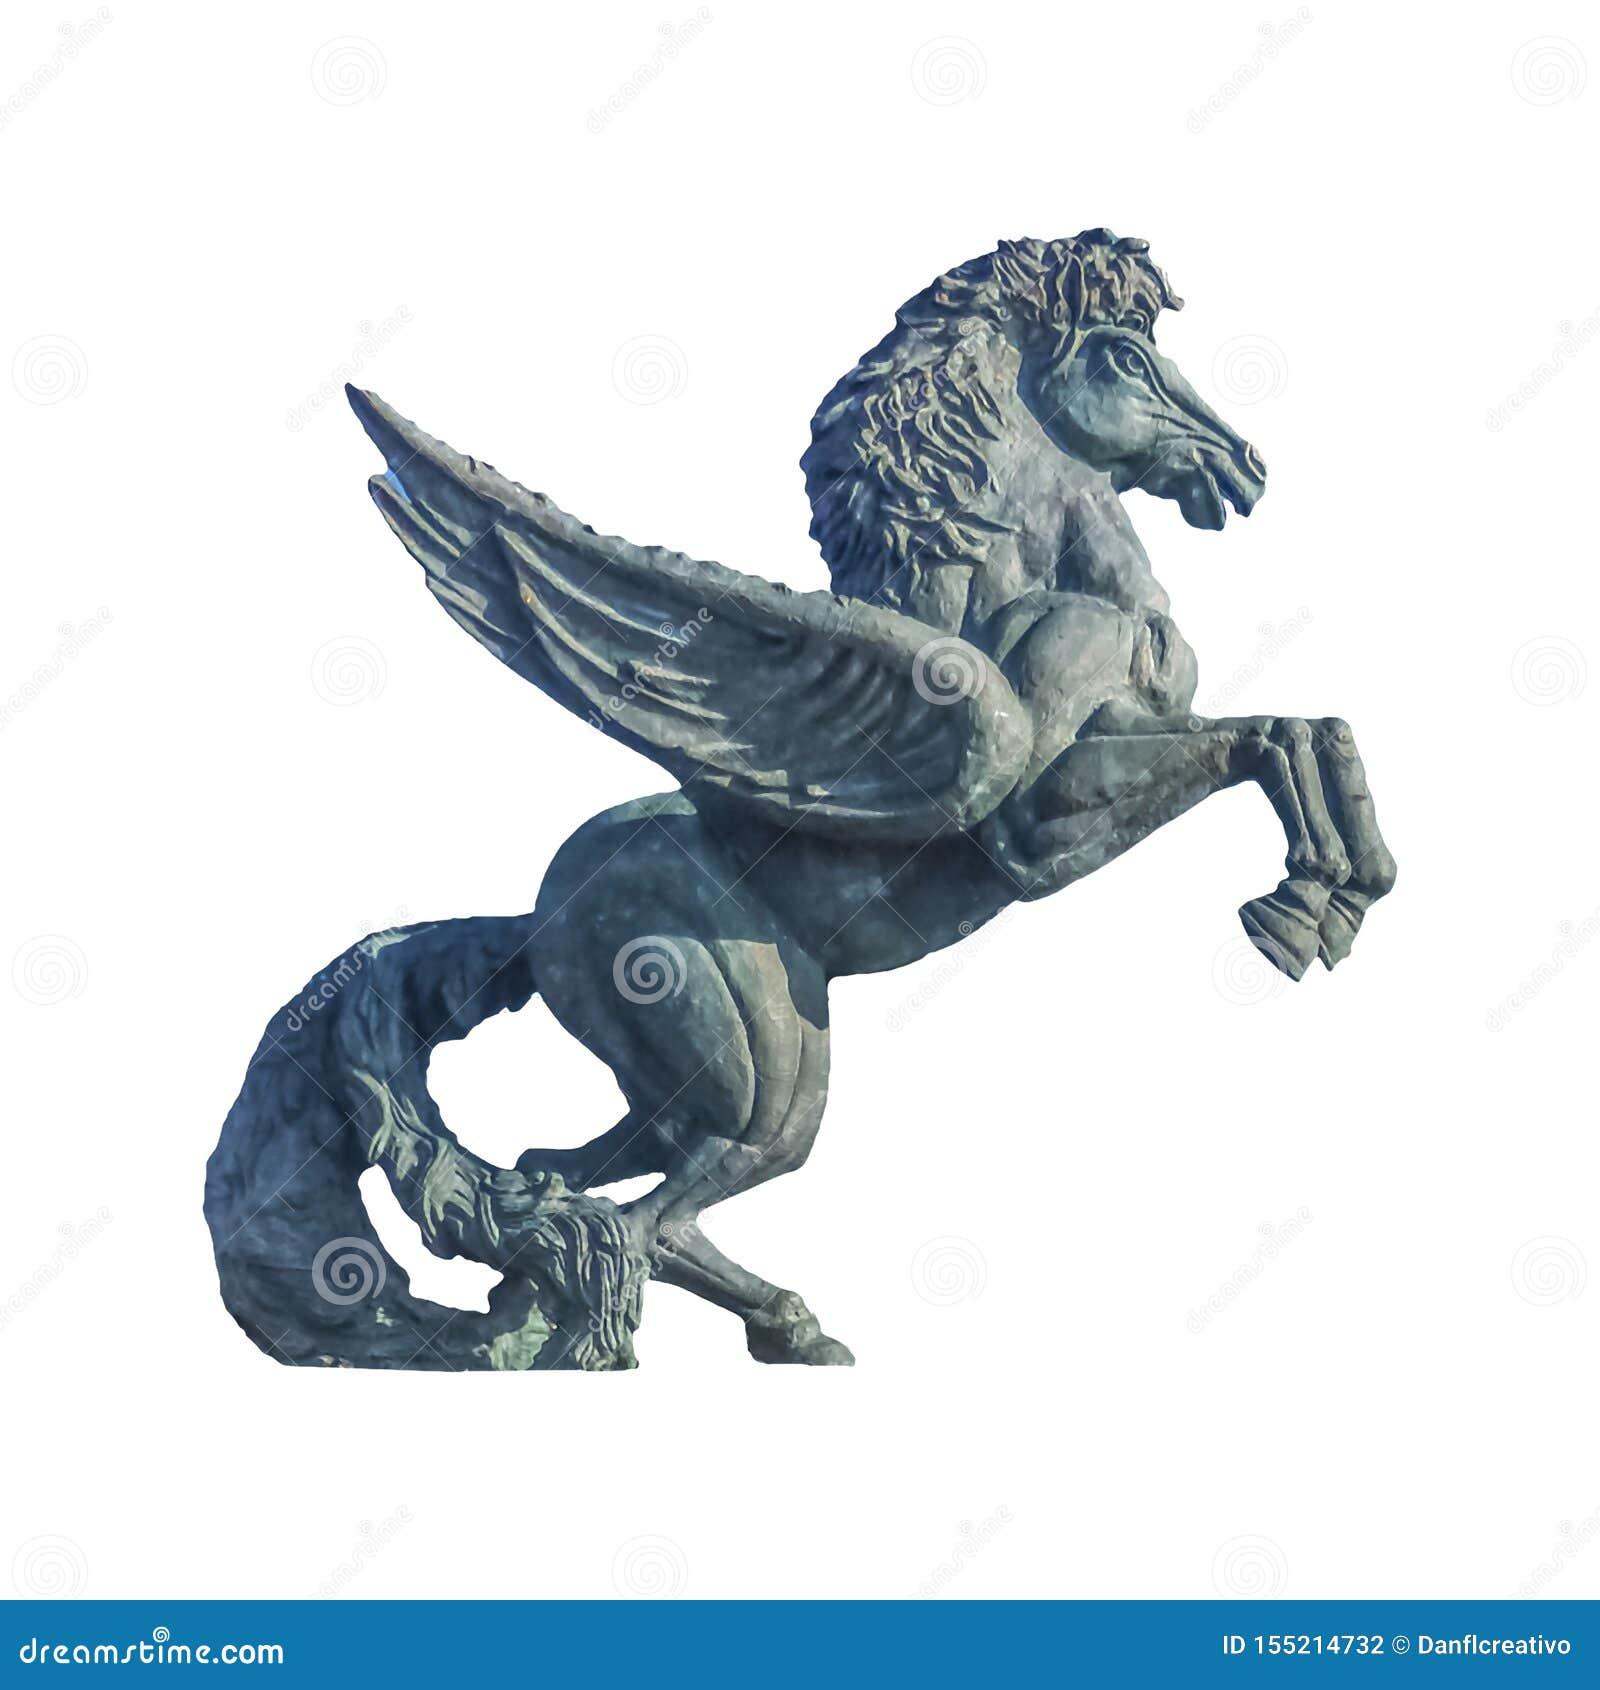 Winged Horse Sculpture Isolated Photo Stock Photo Image Of Freedom Horse 155214732